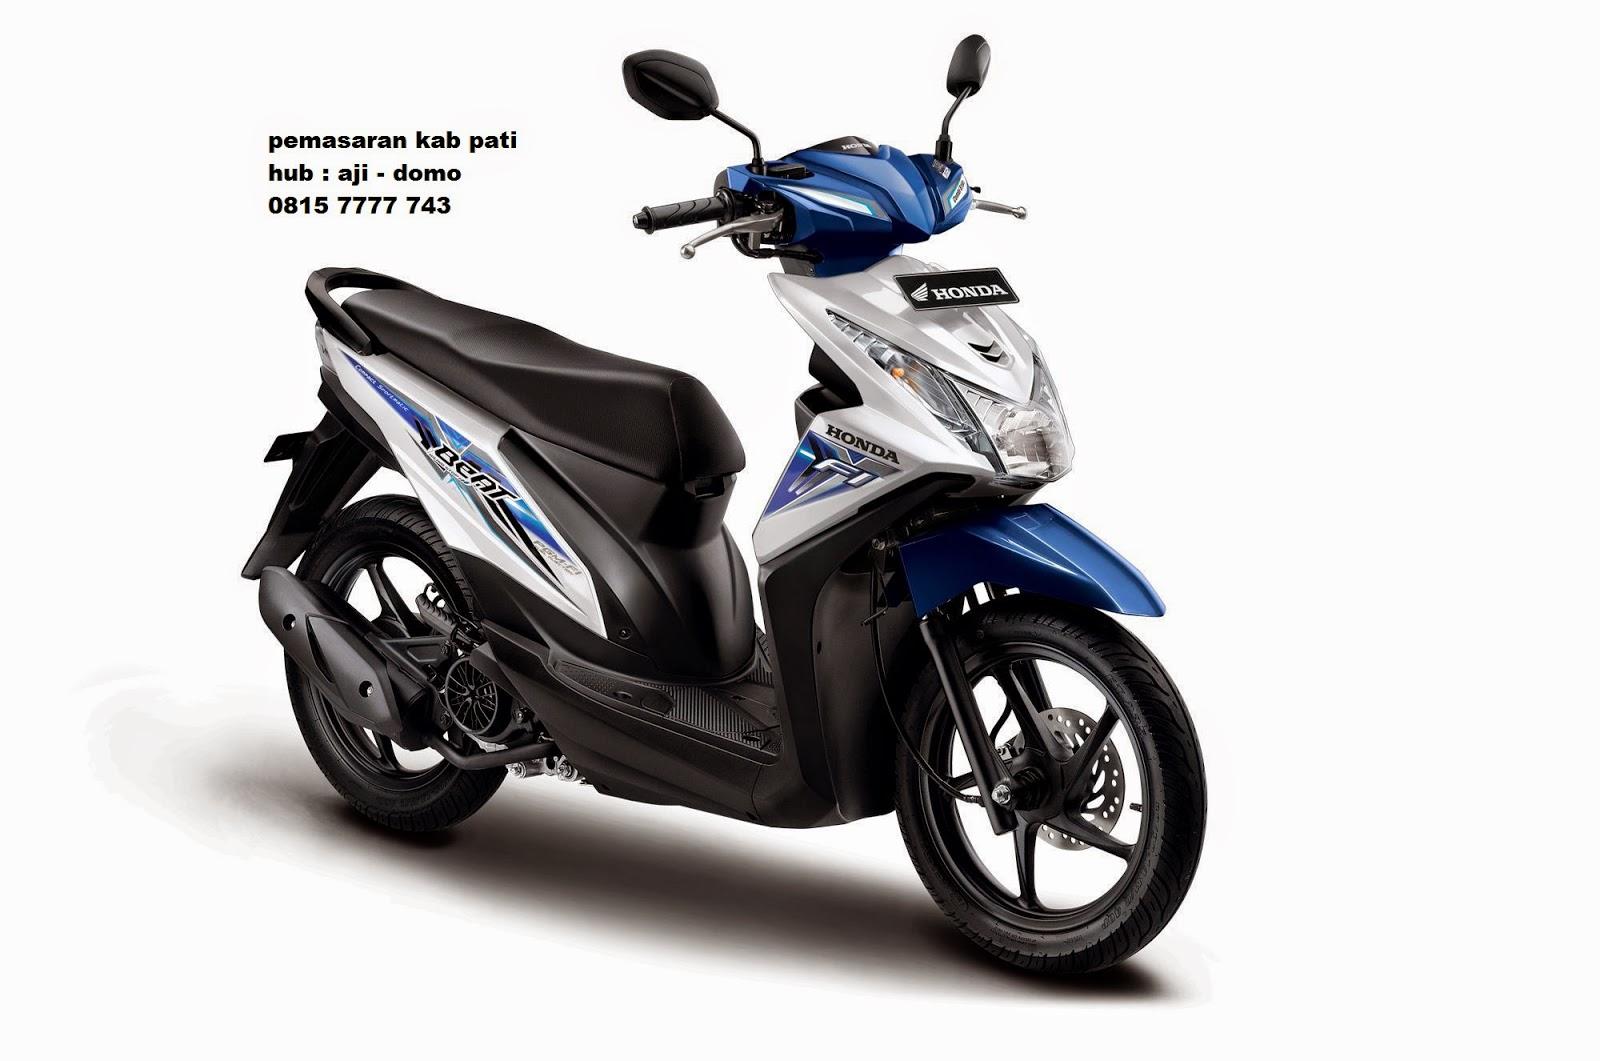 Cashkredit Motor Beat Esp Cw Daftar Harga Terkini Dan Terlengkap All New Sporty Cbs Iss Soul Red White Kudus Honda